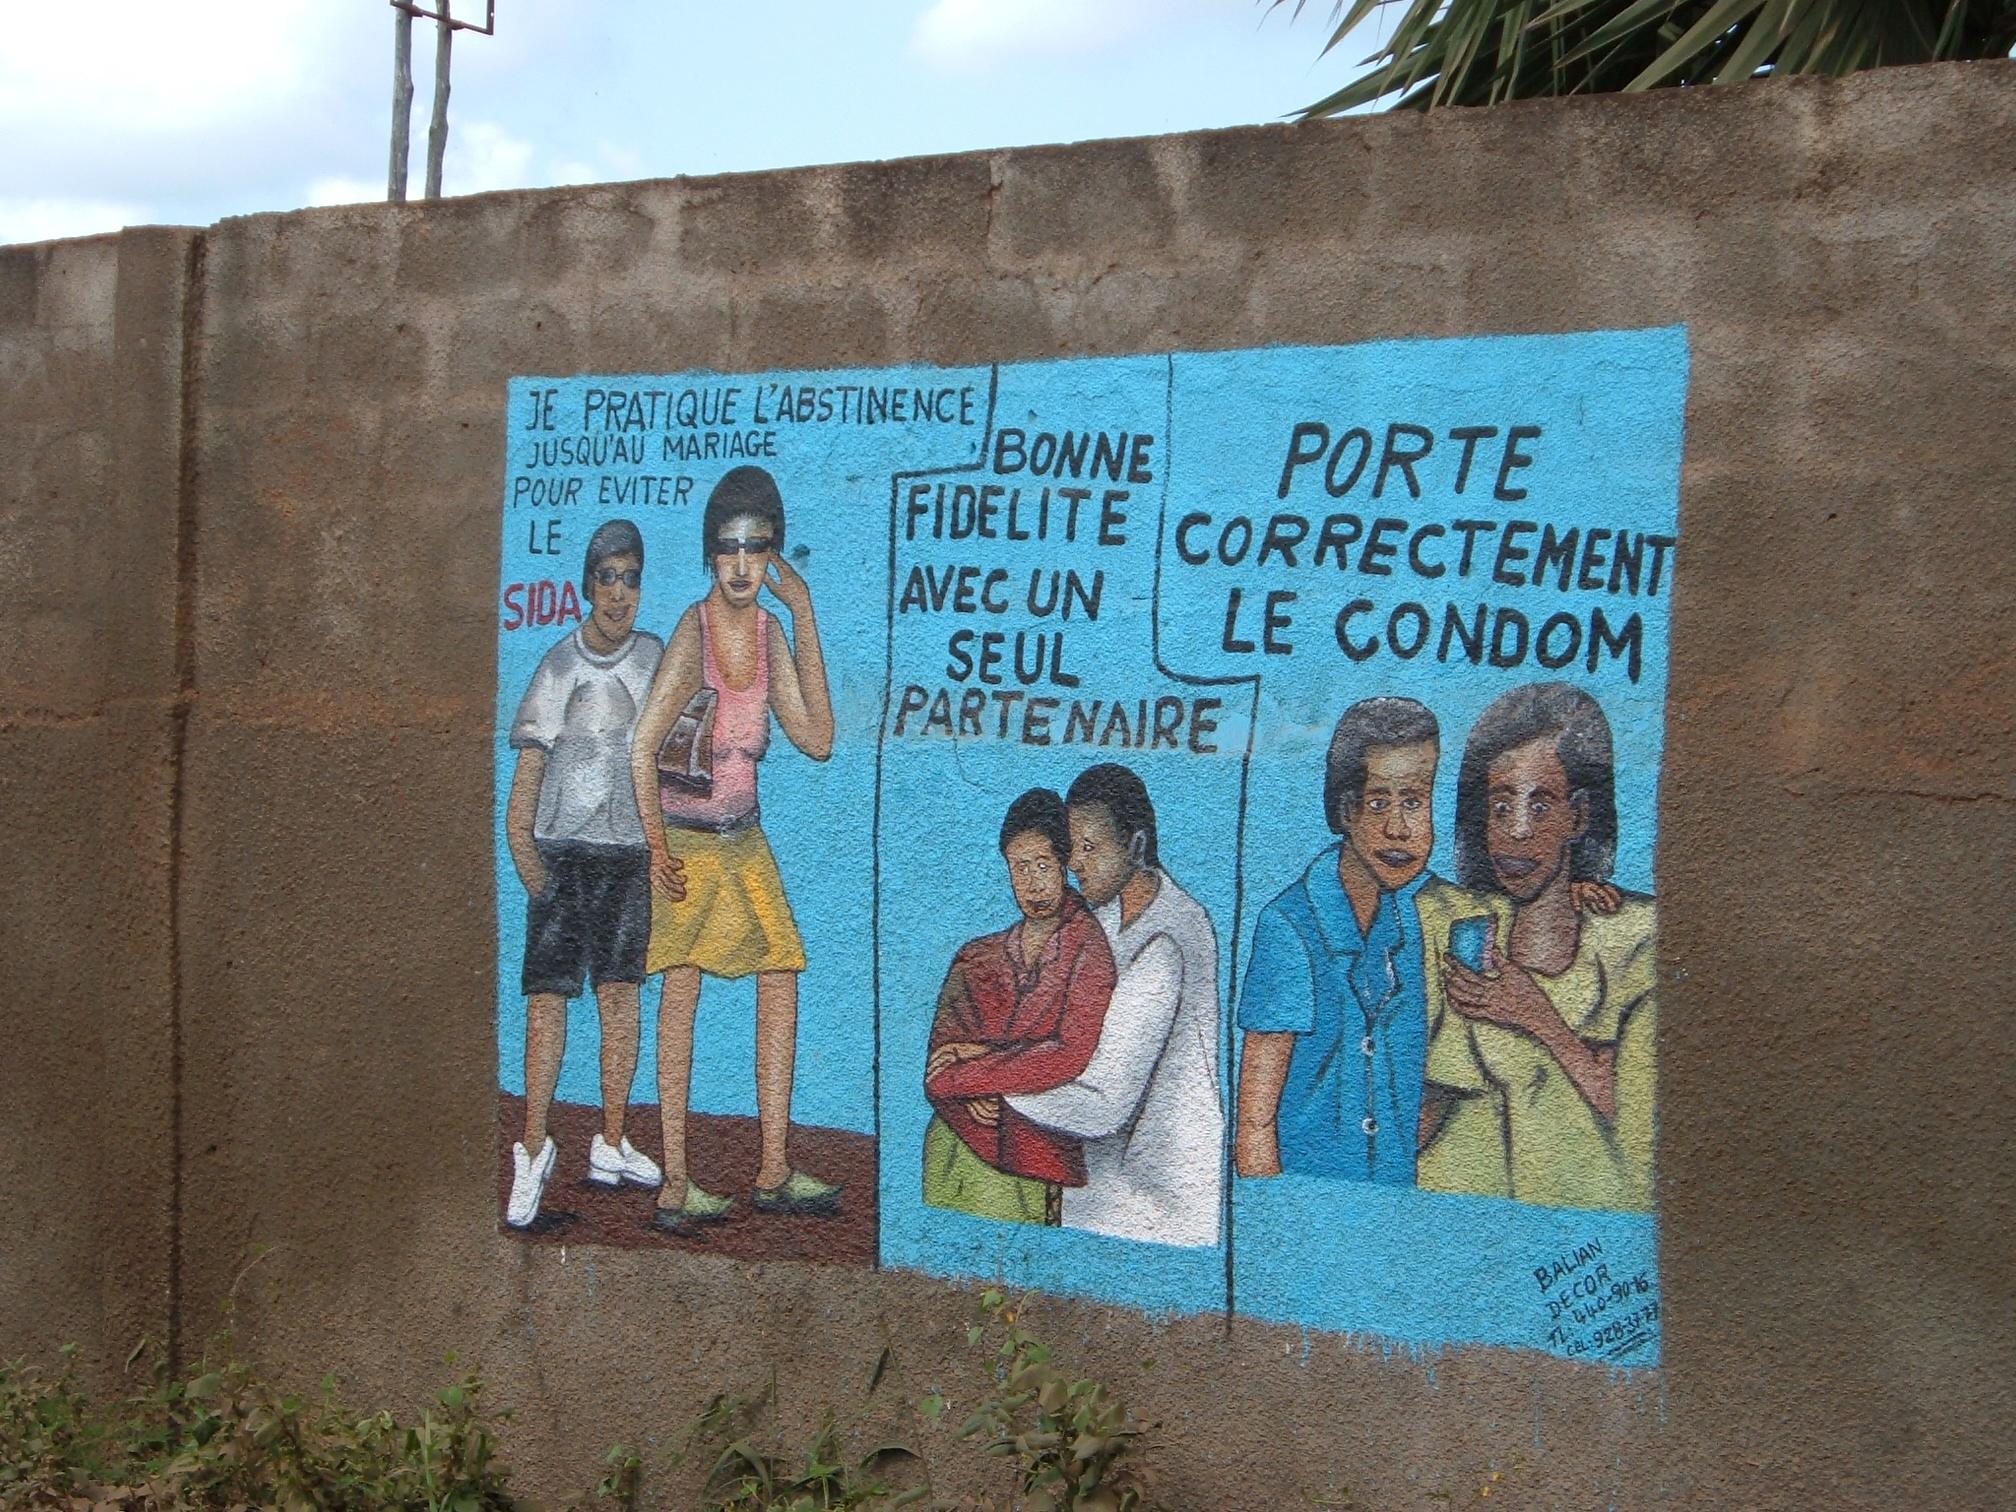 A street mural in Togo, 2005.